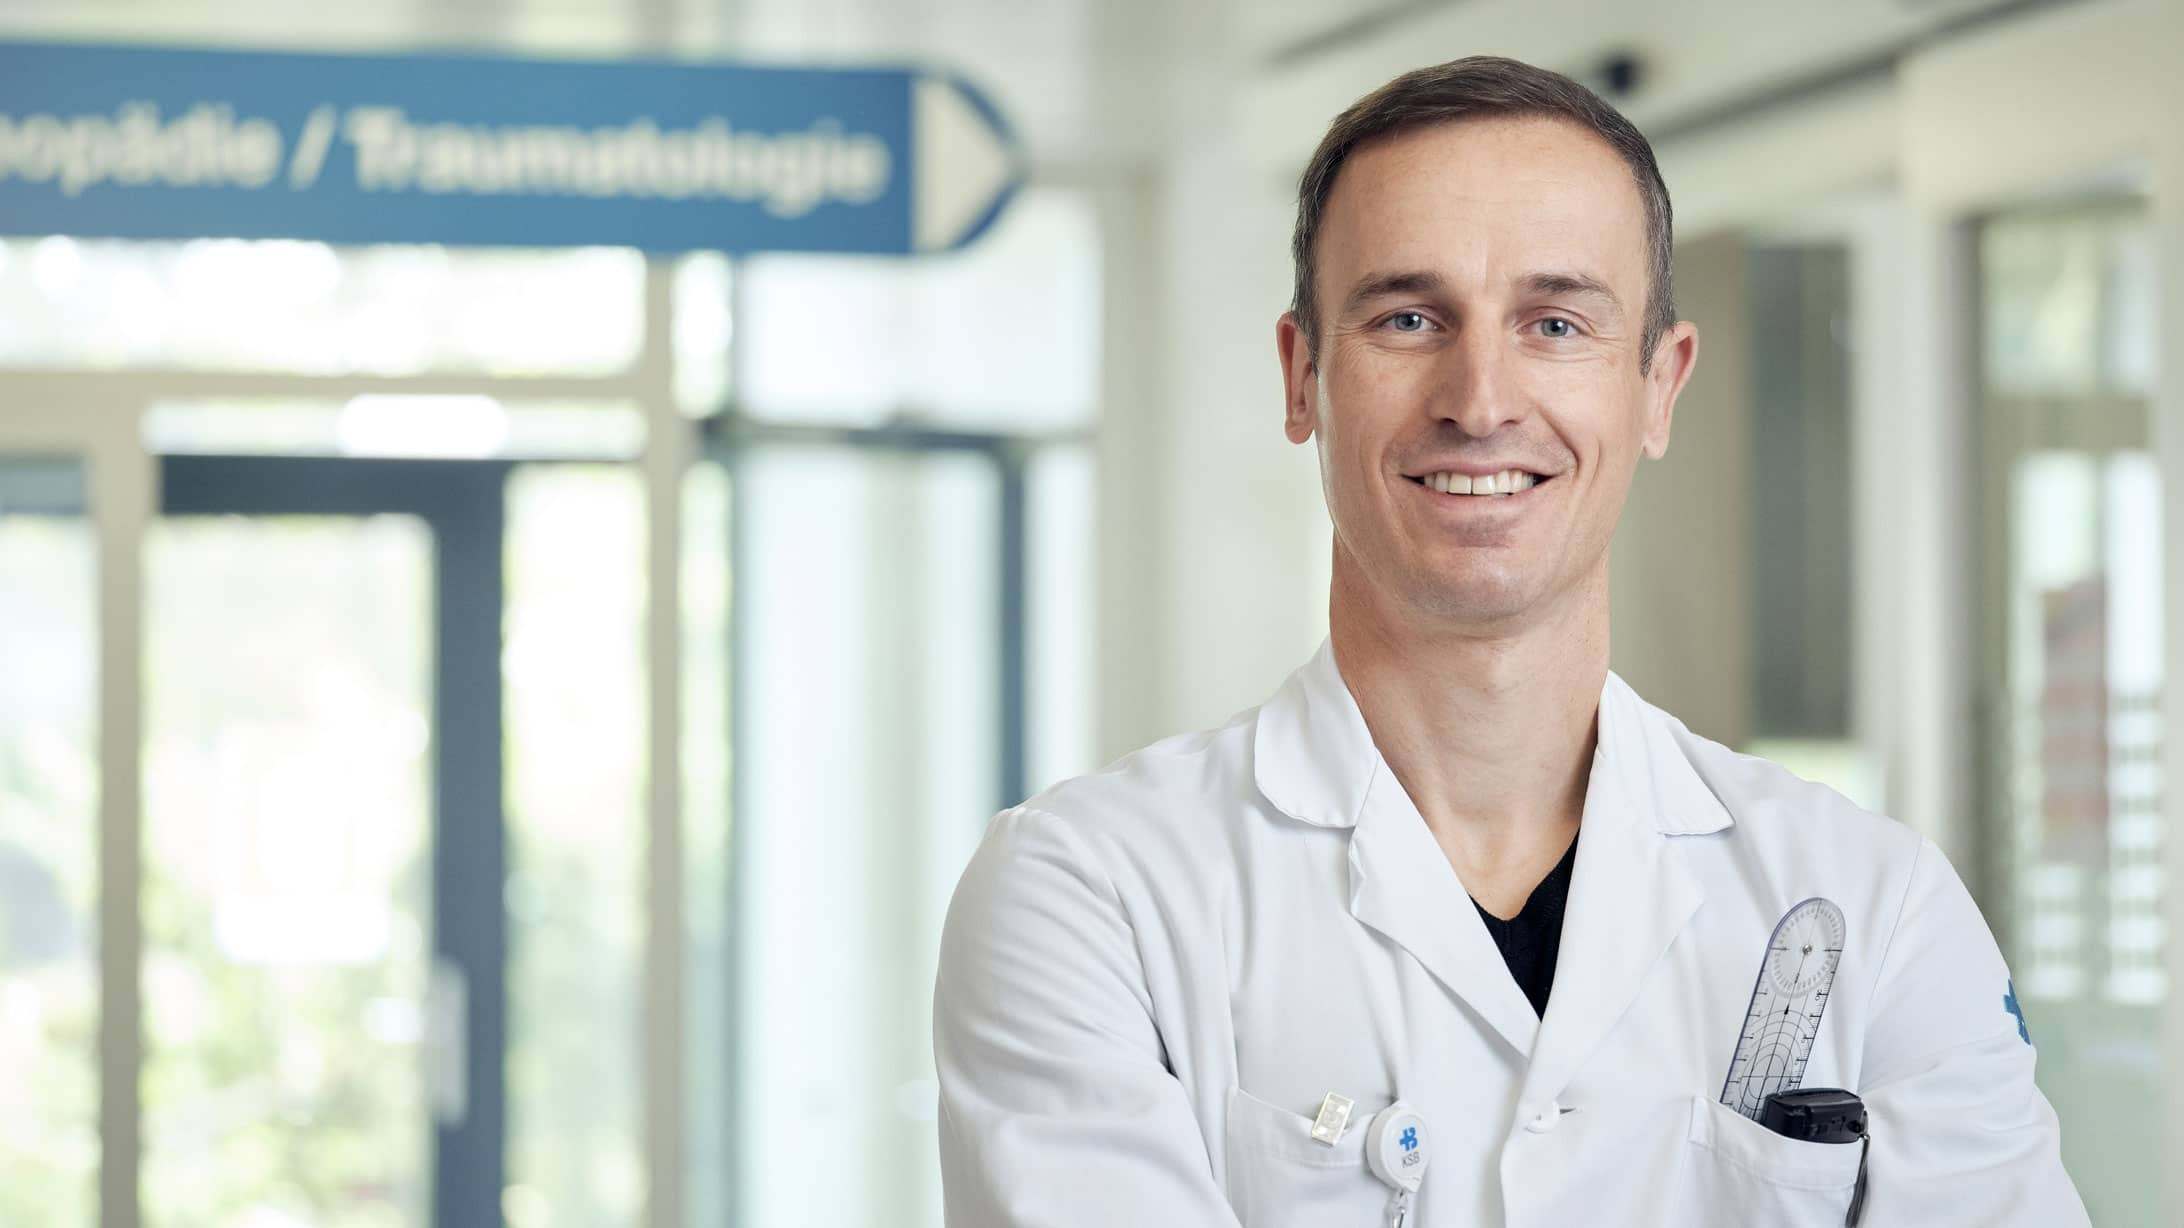 Orthopäde Tobias Bühler in einem Korridor des Kantonsspitals Baden